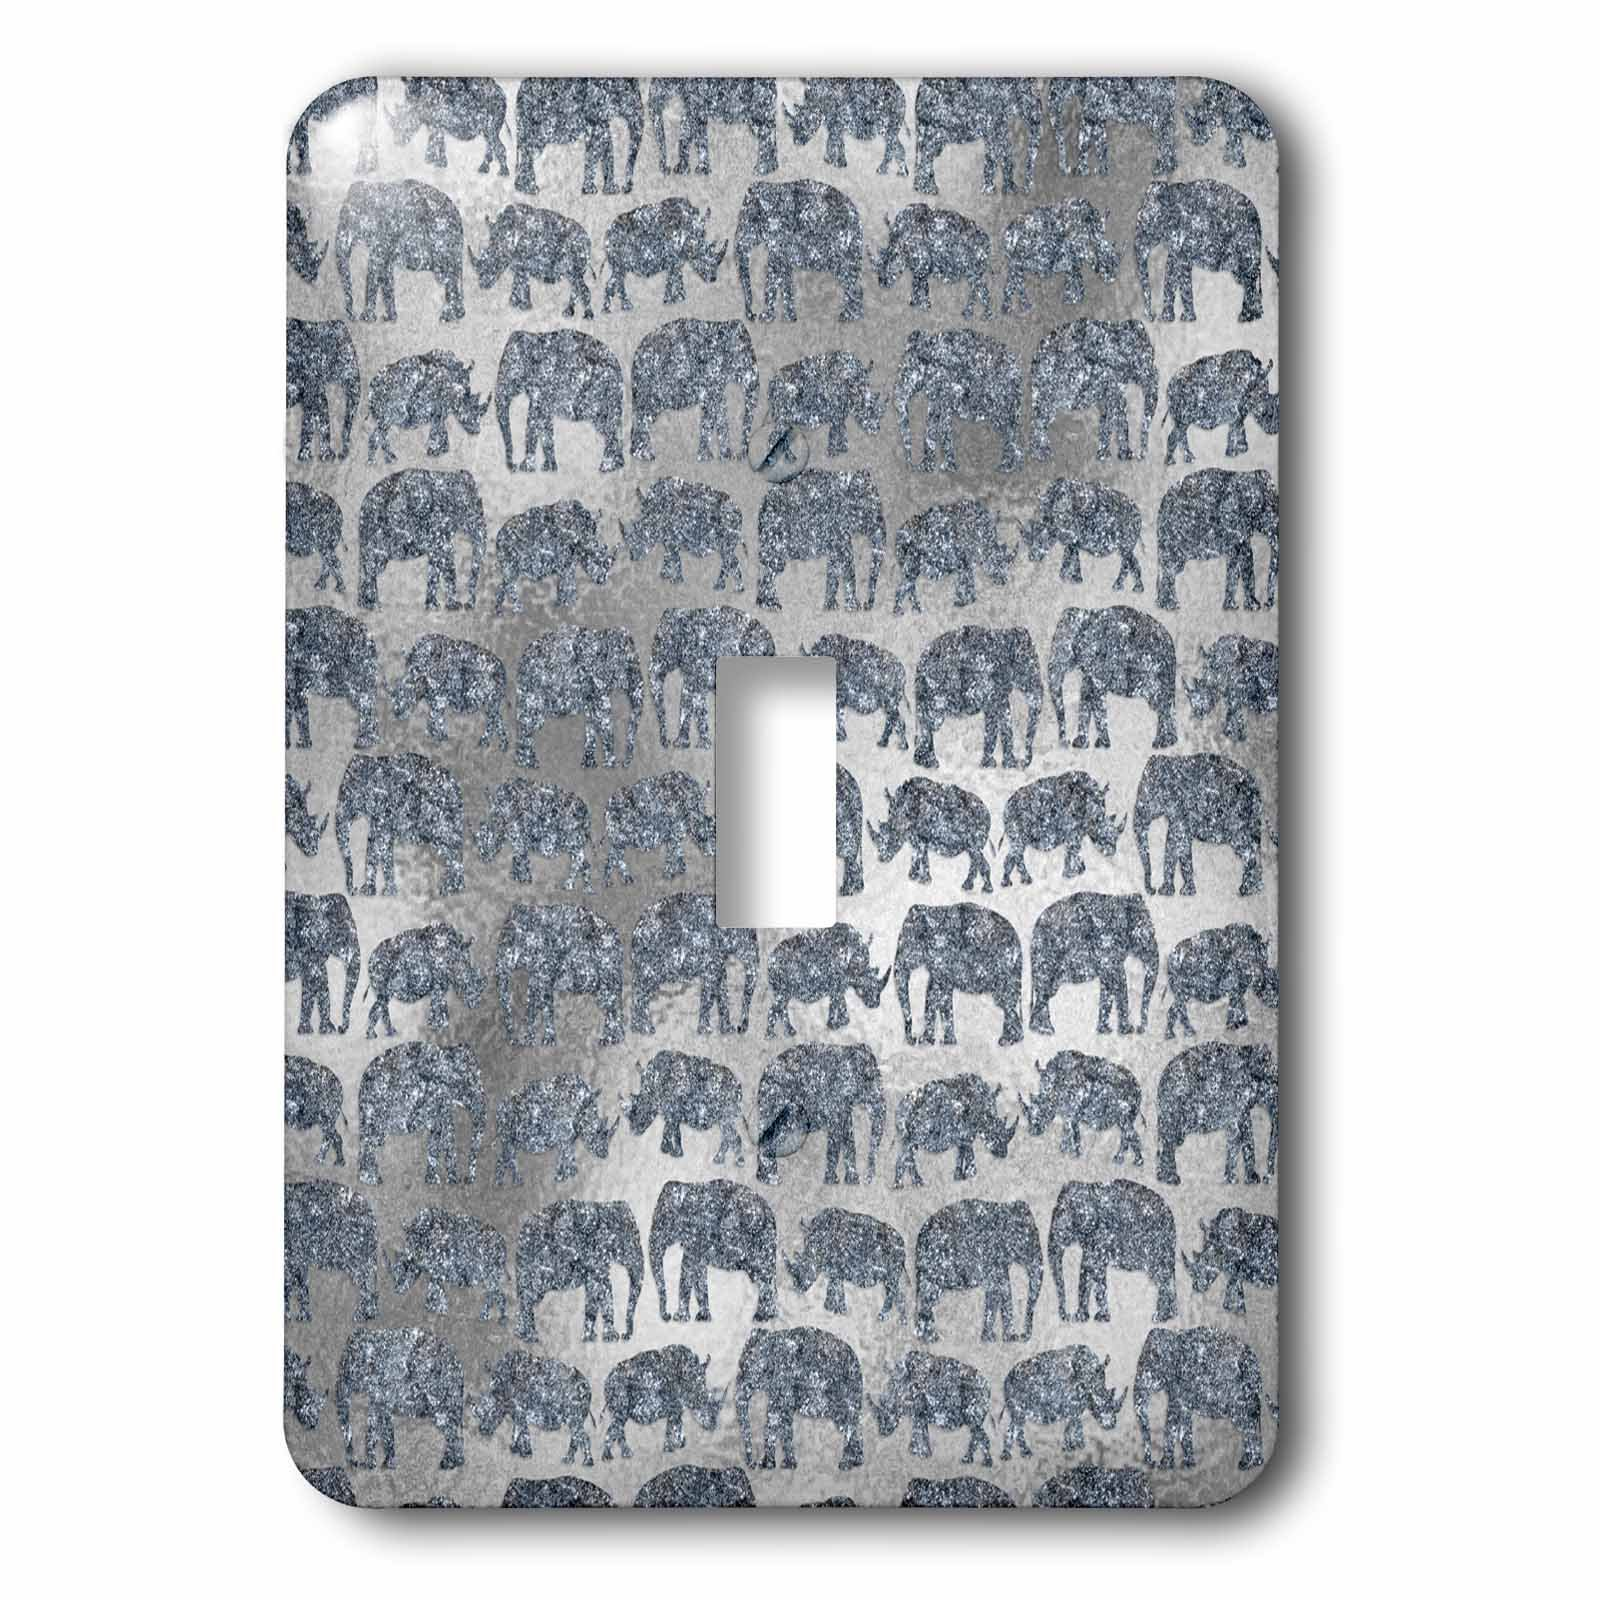 3dRose (lsp_269042_1) Single Toggle Switch (1) Luxury Silver Shiny Chic Animal Elephant Africa Safari Pattern